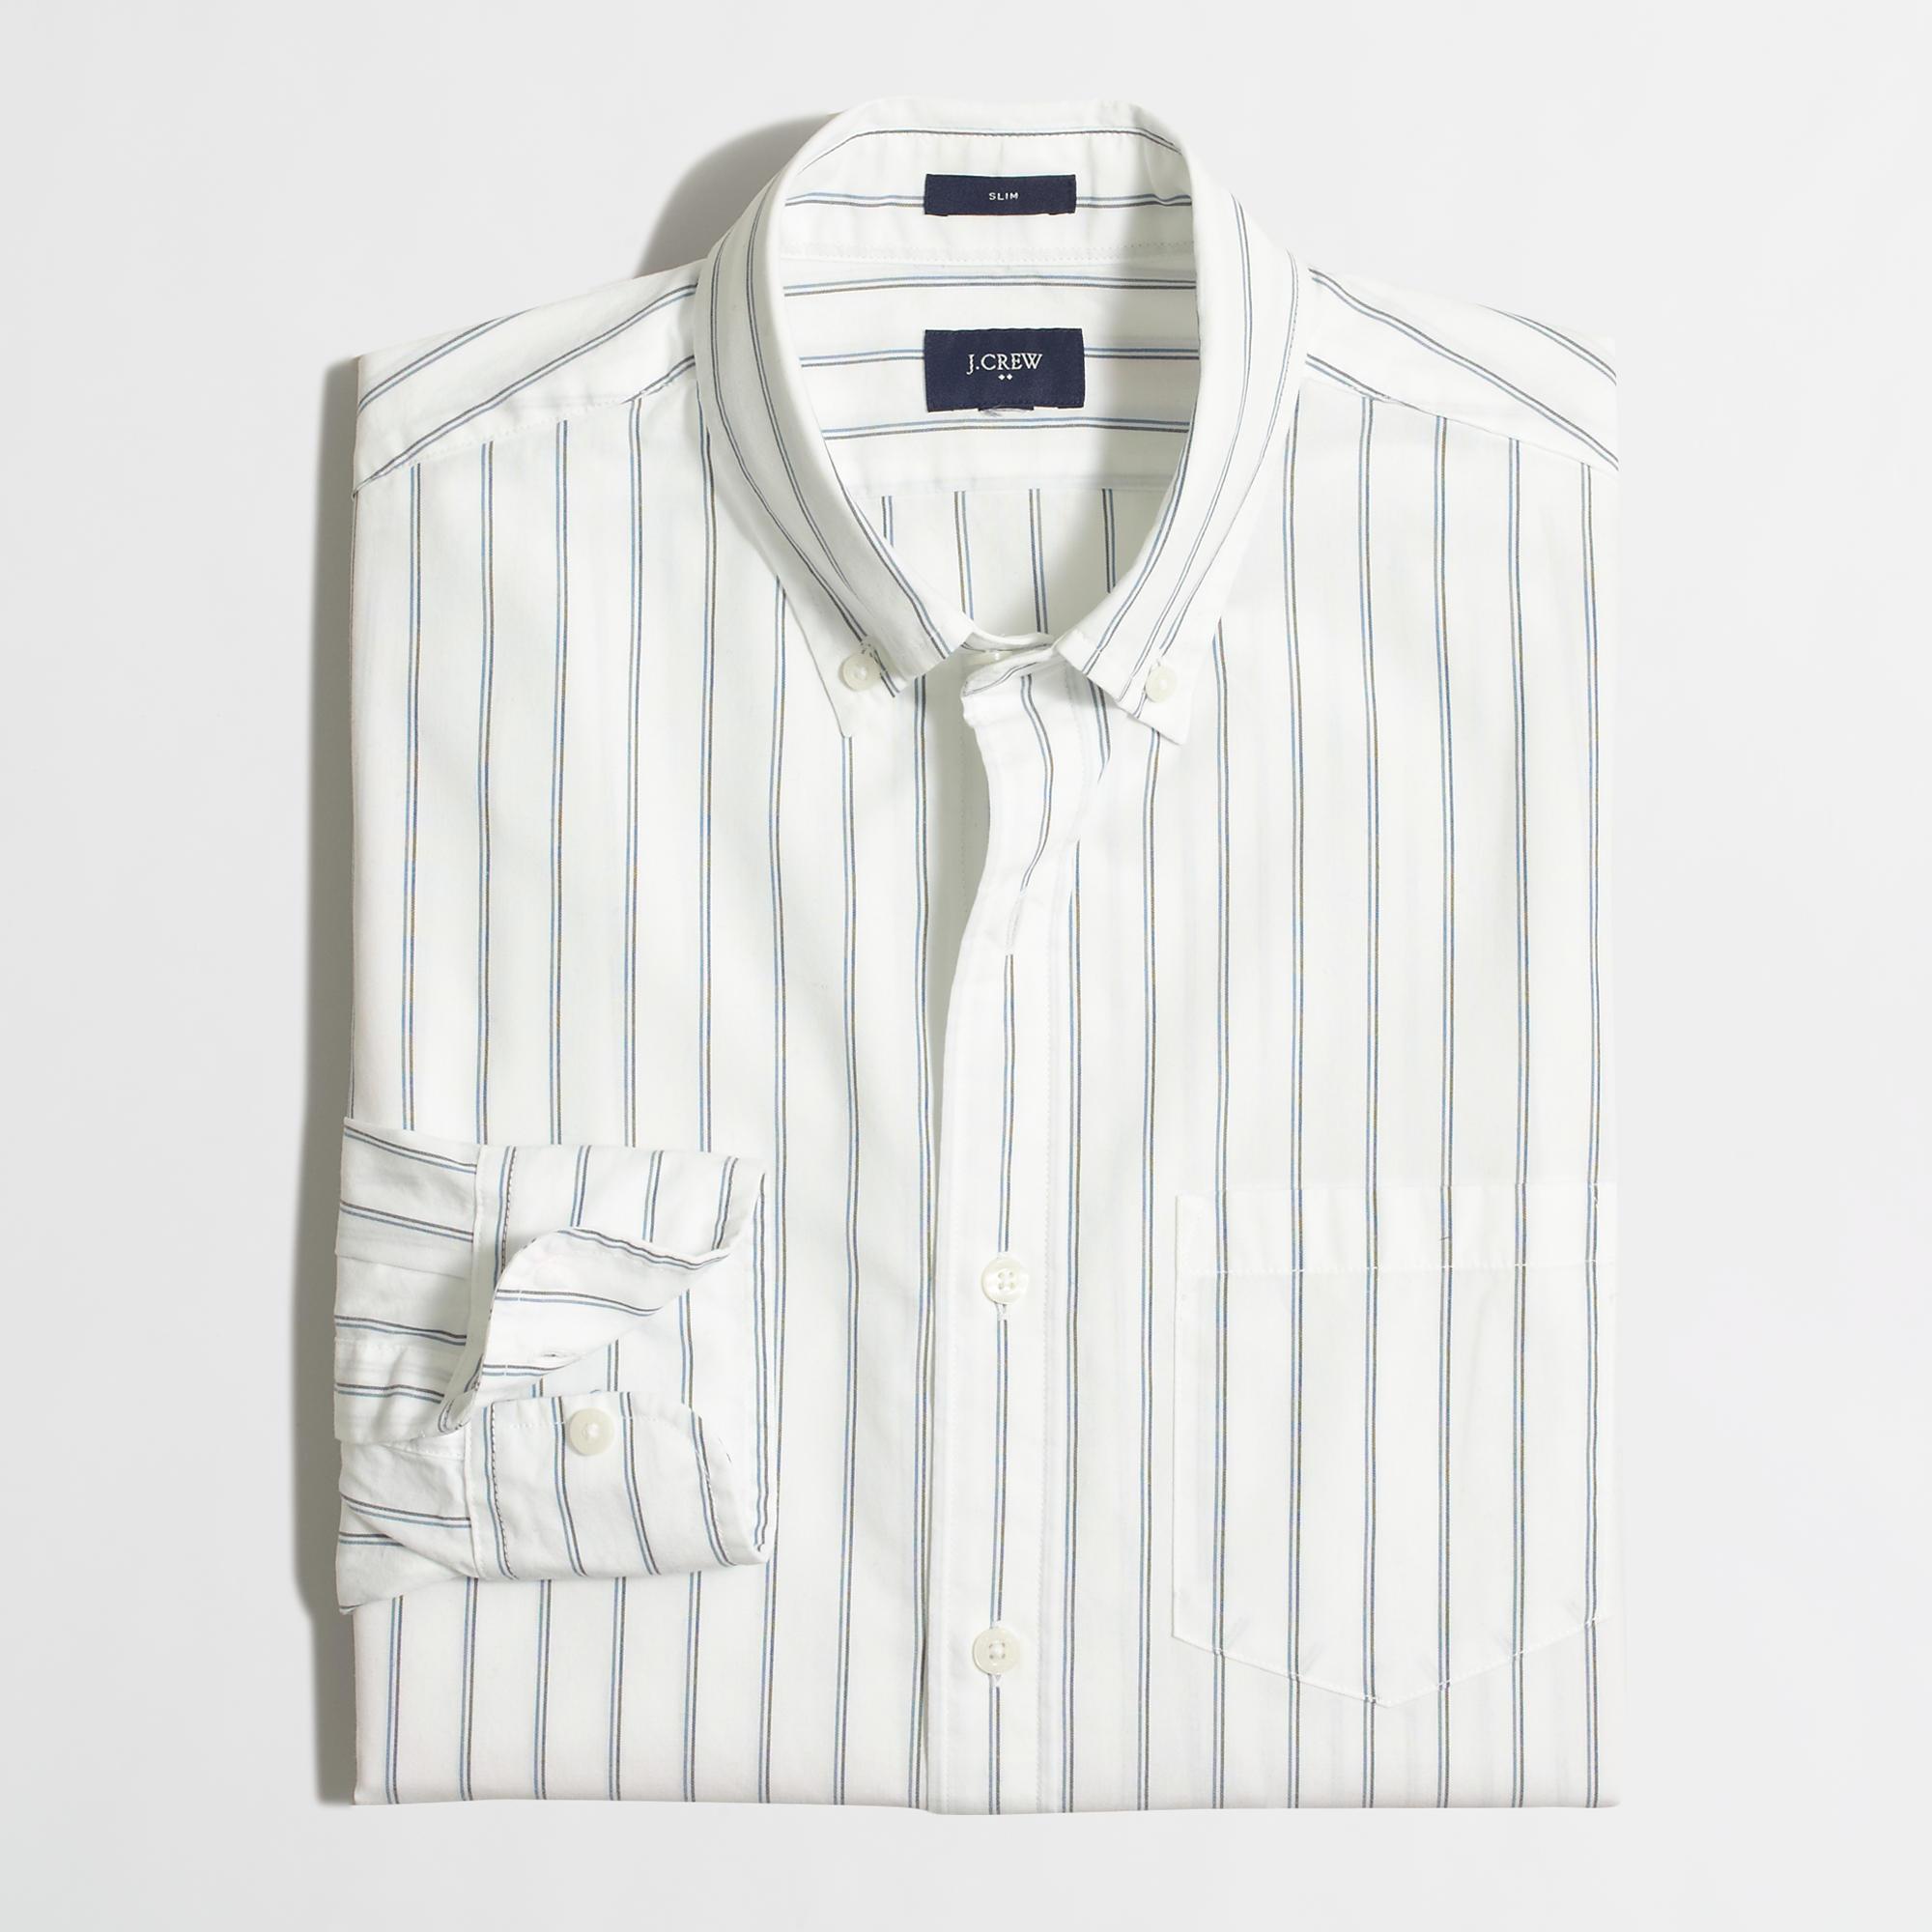 86326b046 Marc Jacobs Shirts For Men | Wiring Diagram Database